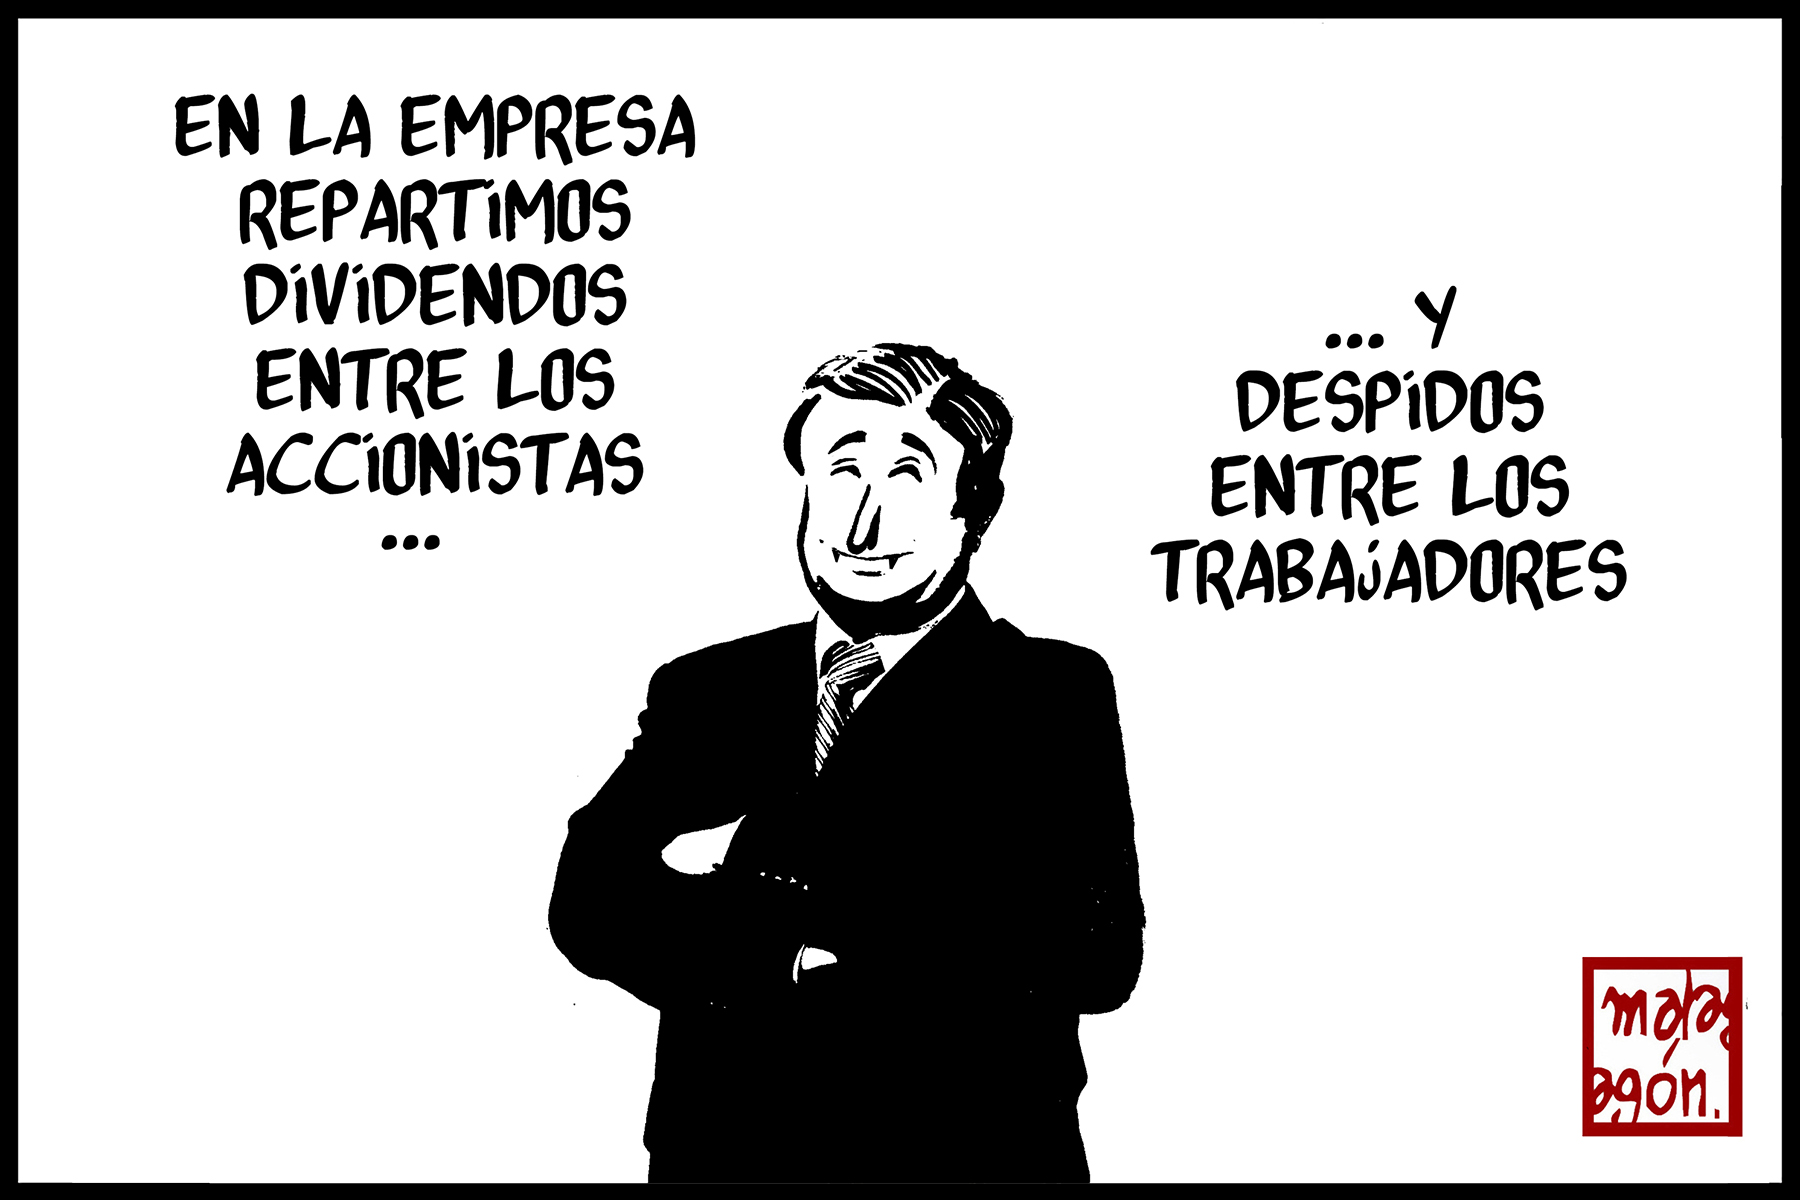 <p>Despidos.</p>